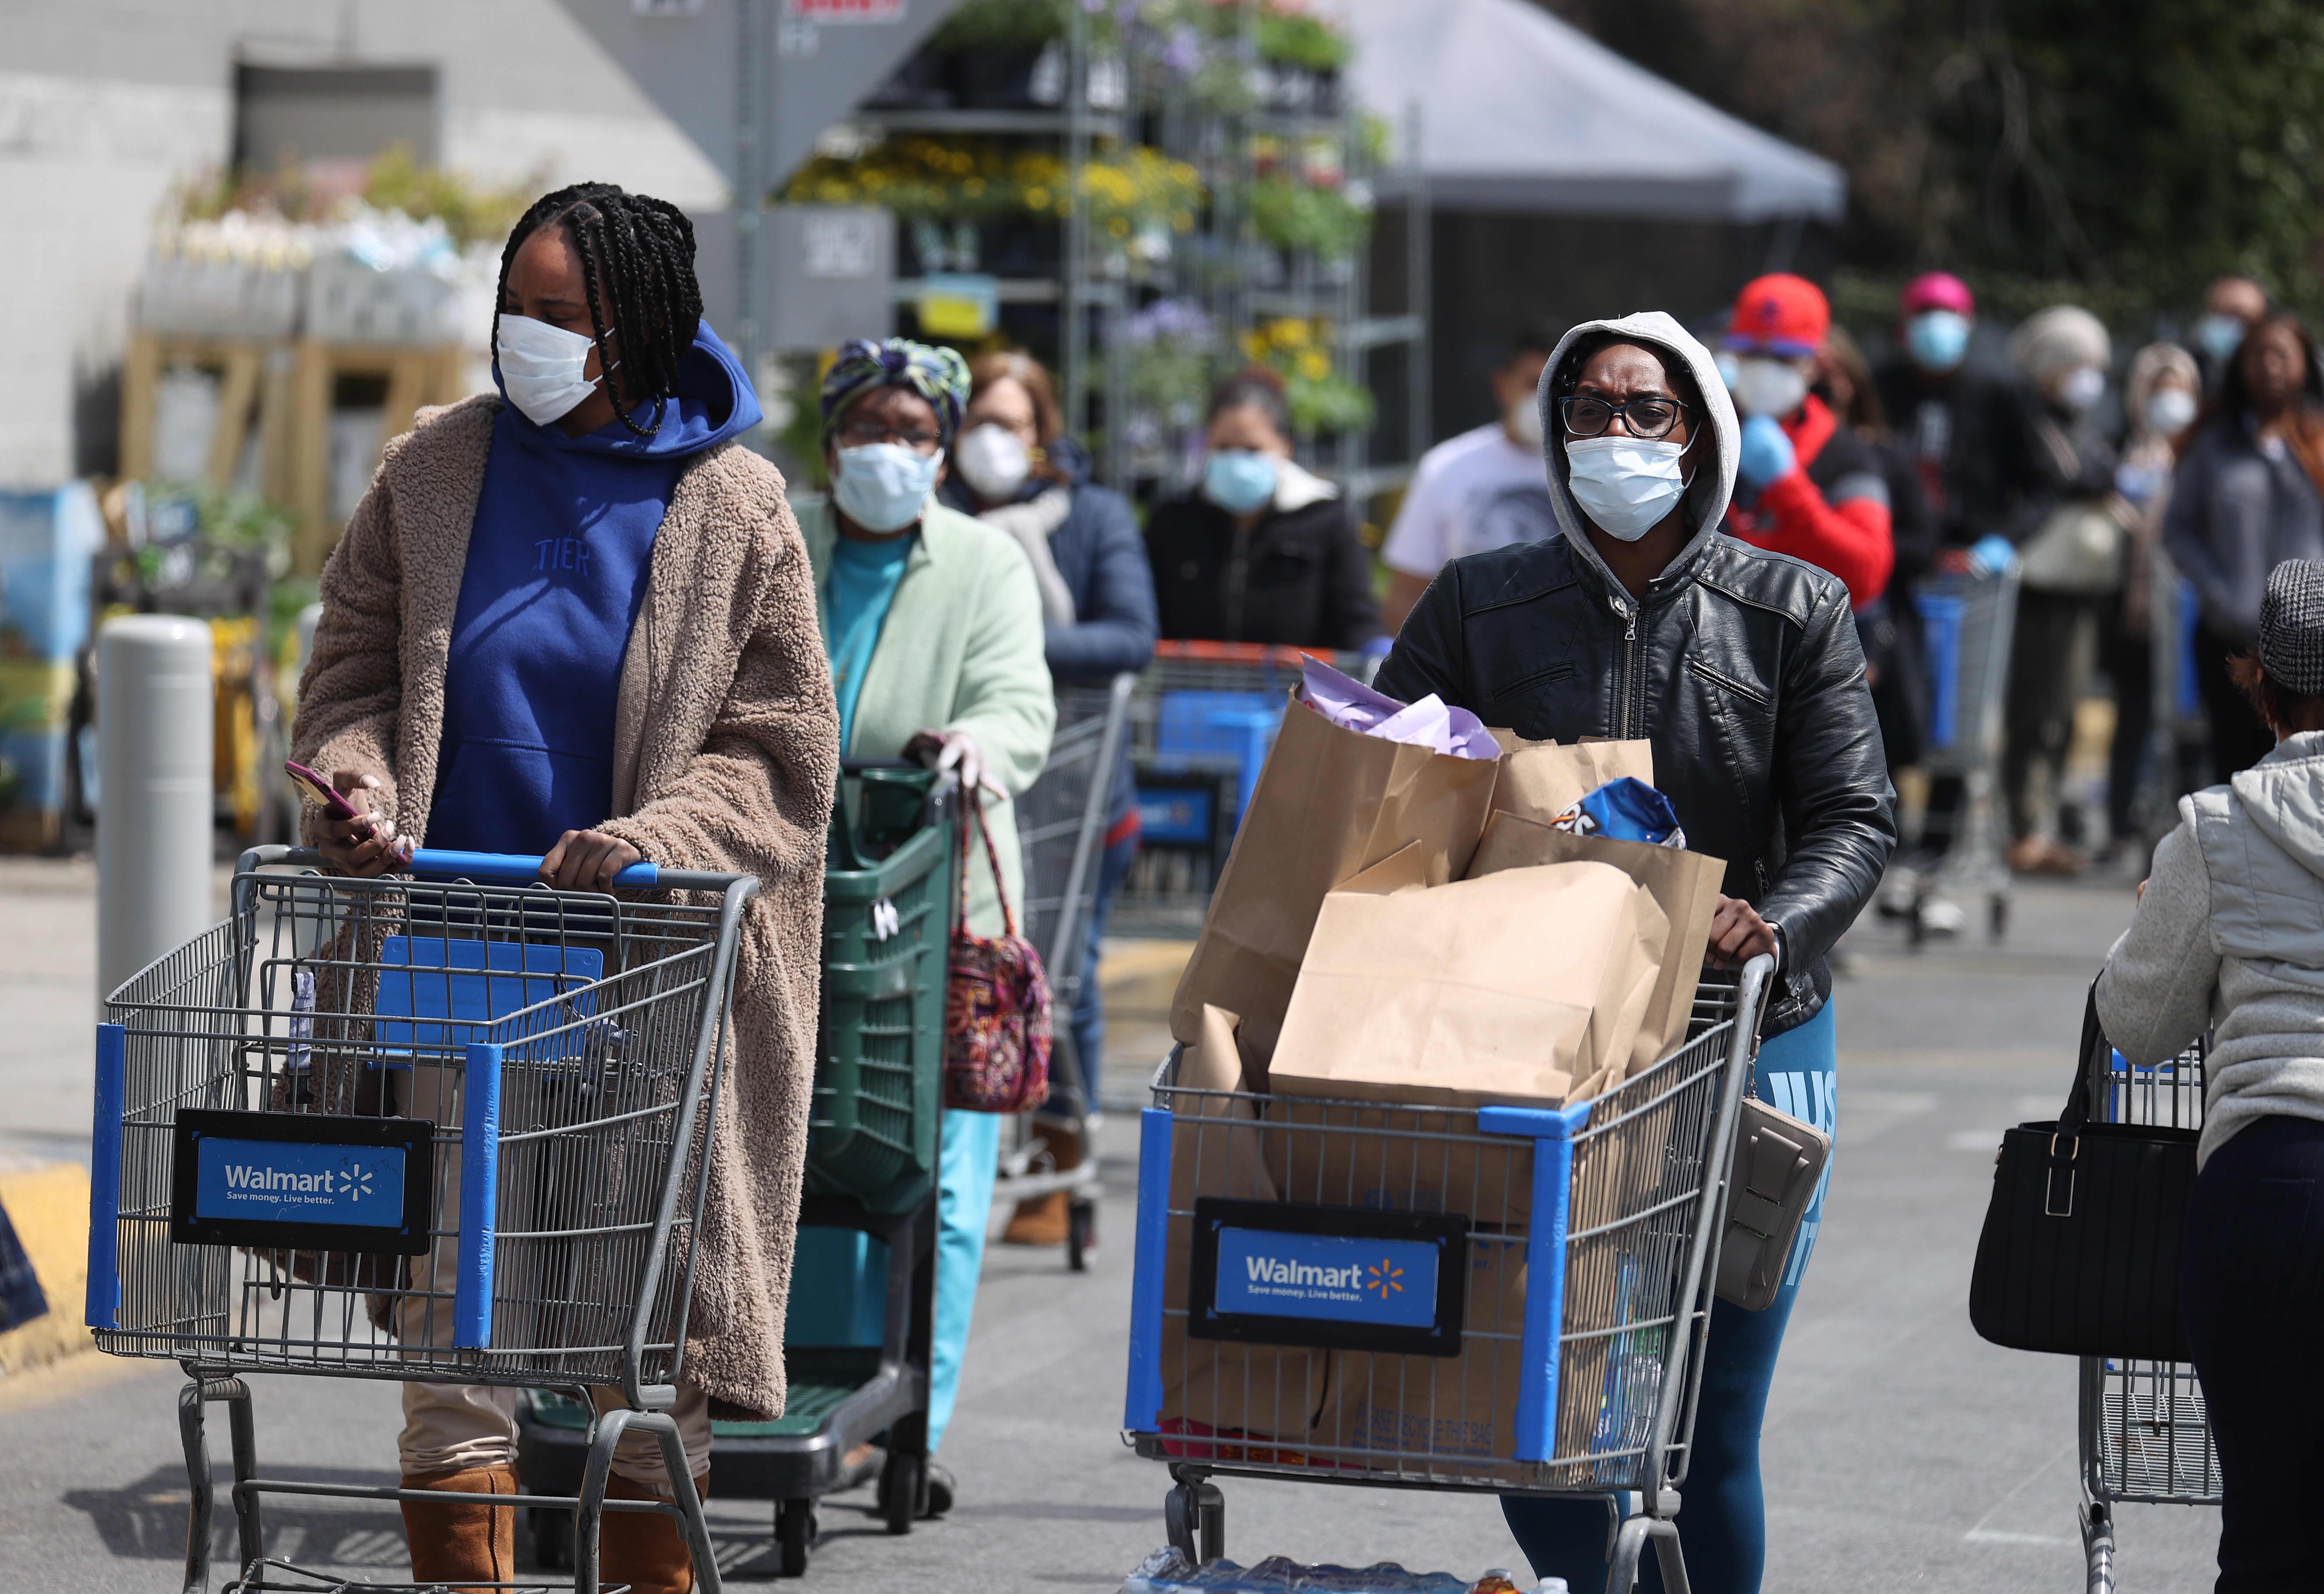 Walmart to require associates to wear masks at work